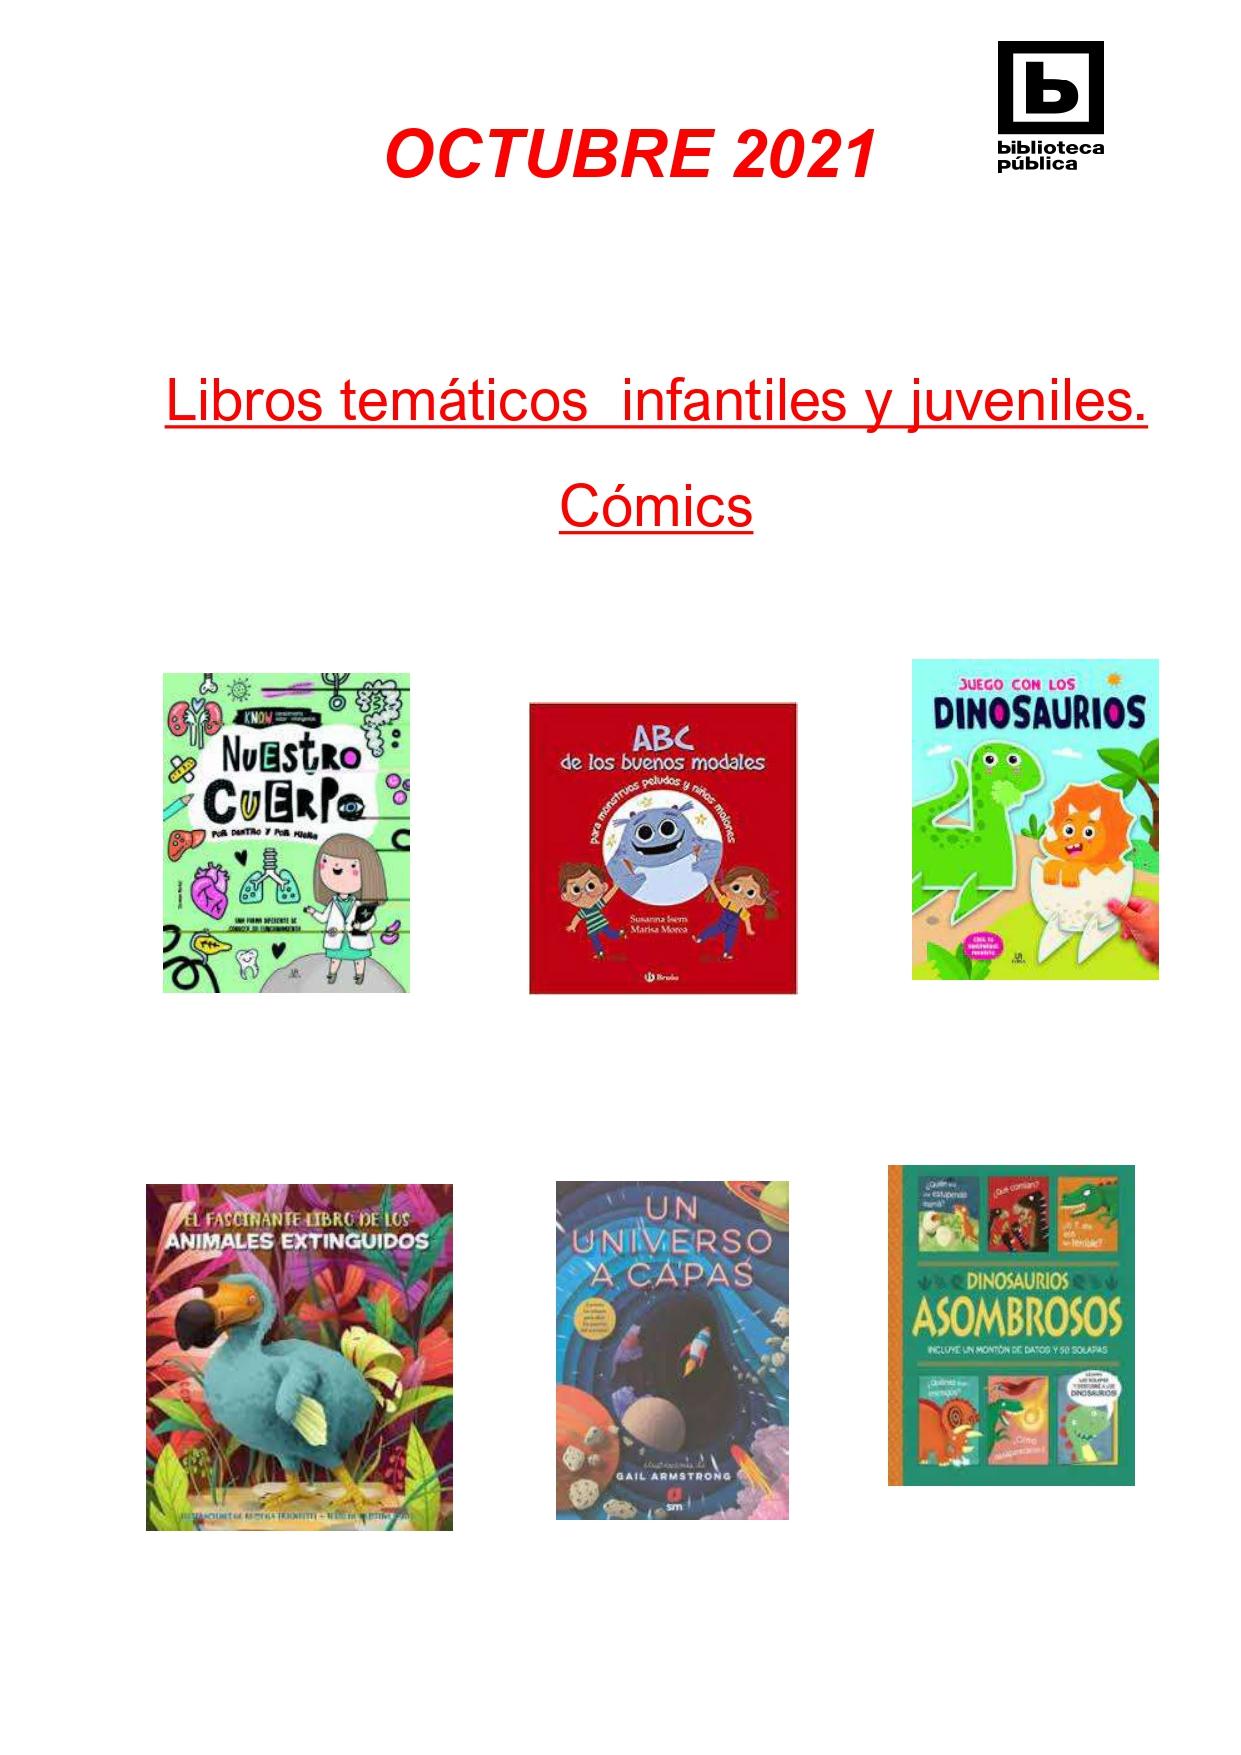 NOVEDADES INFANTILES / JUVENILES OCTUBRE 2021